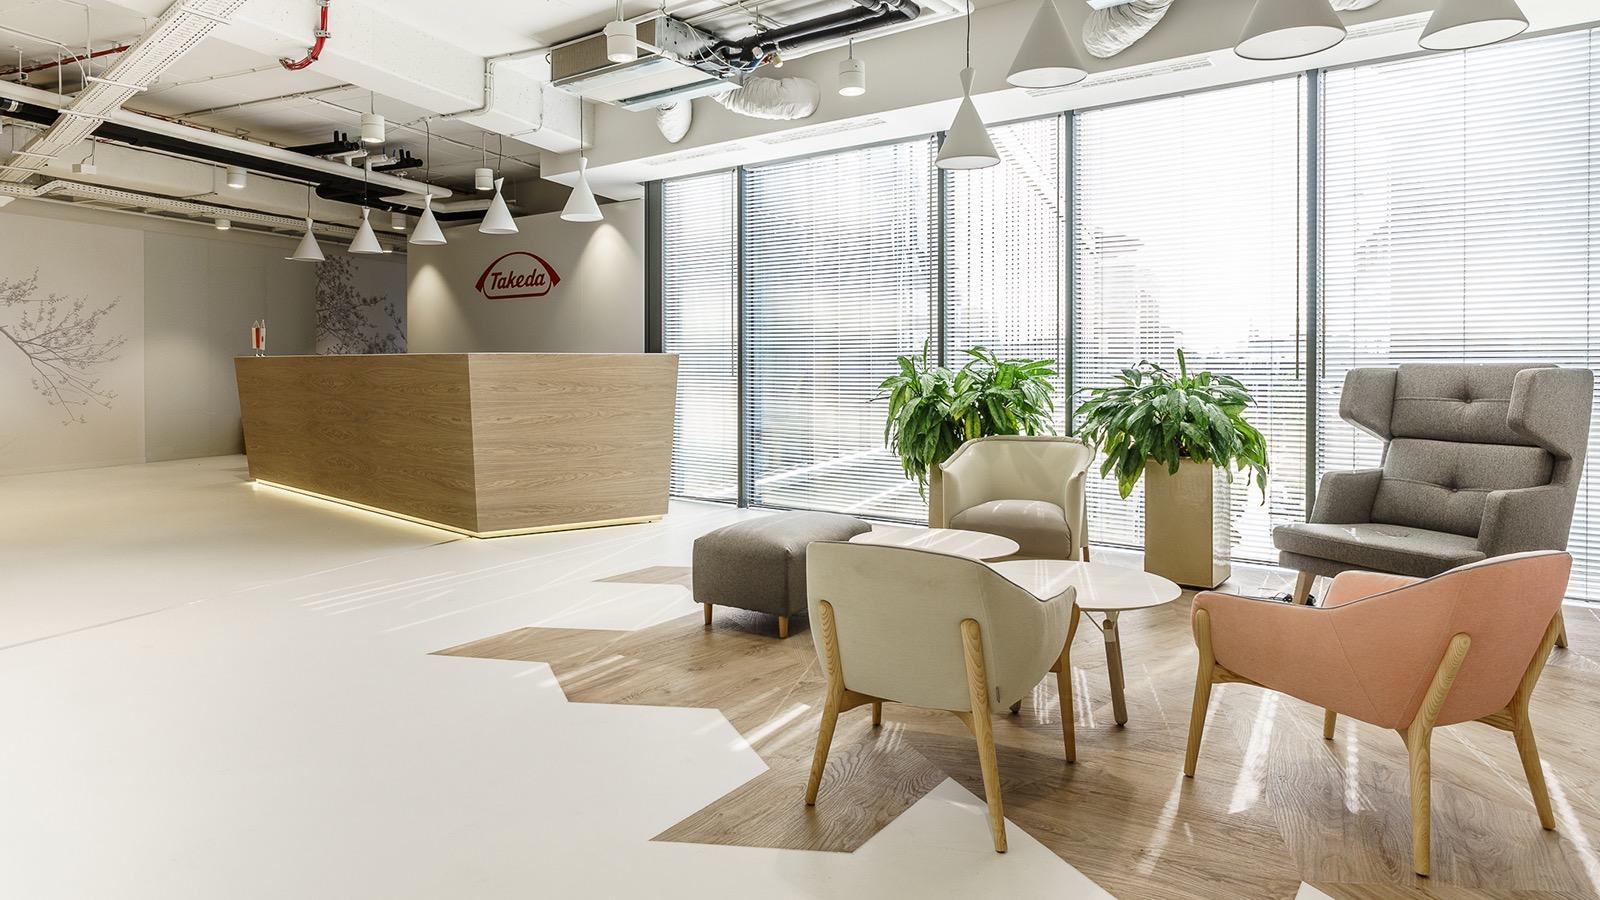 takeda-warsaw-office-1